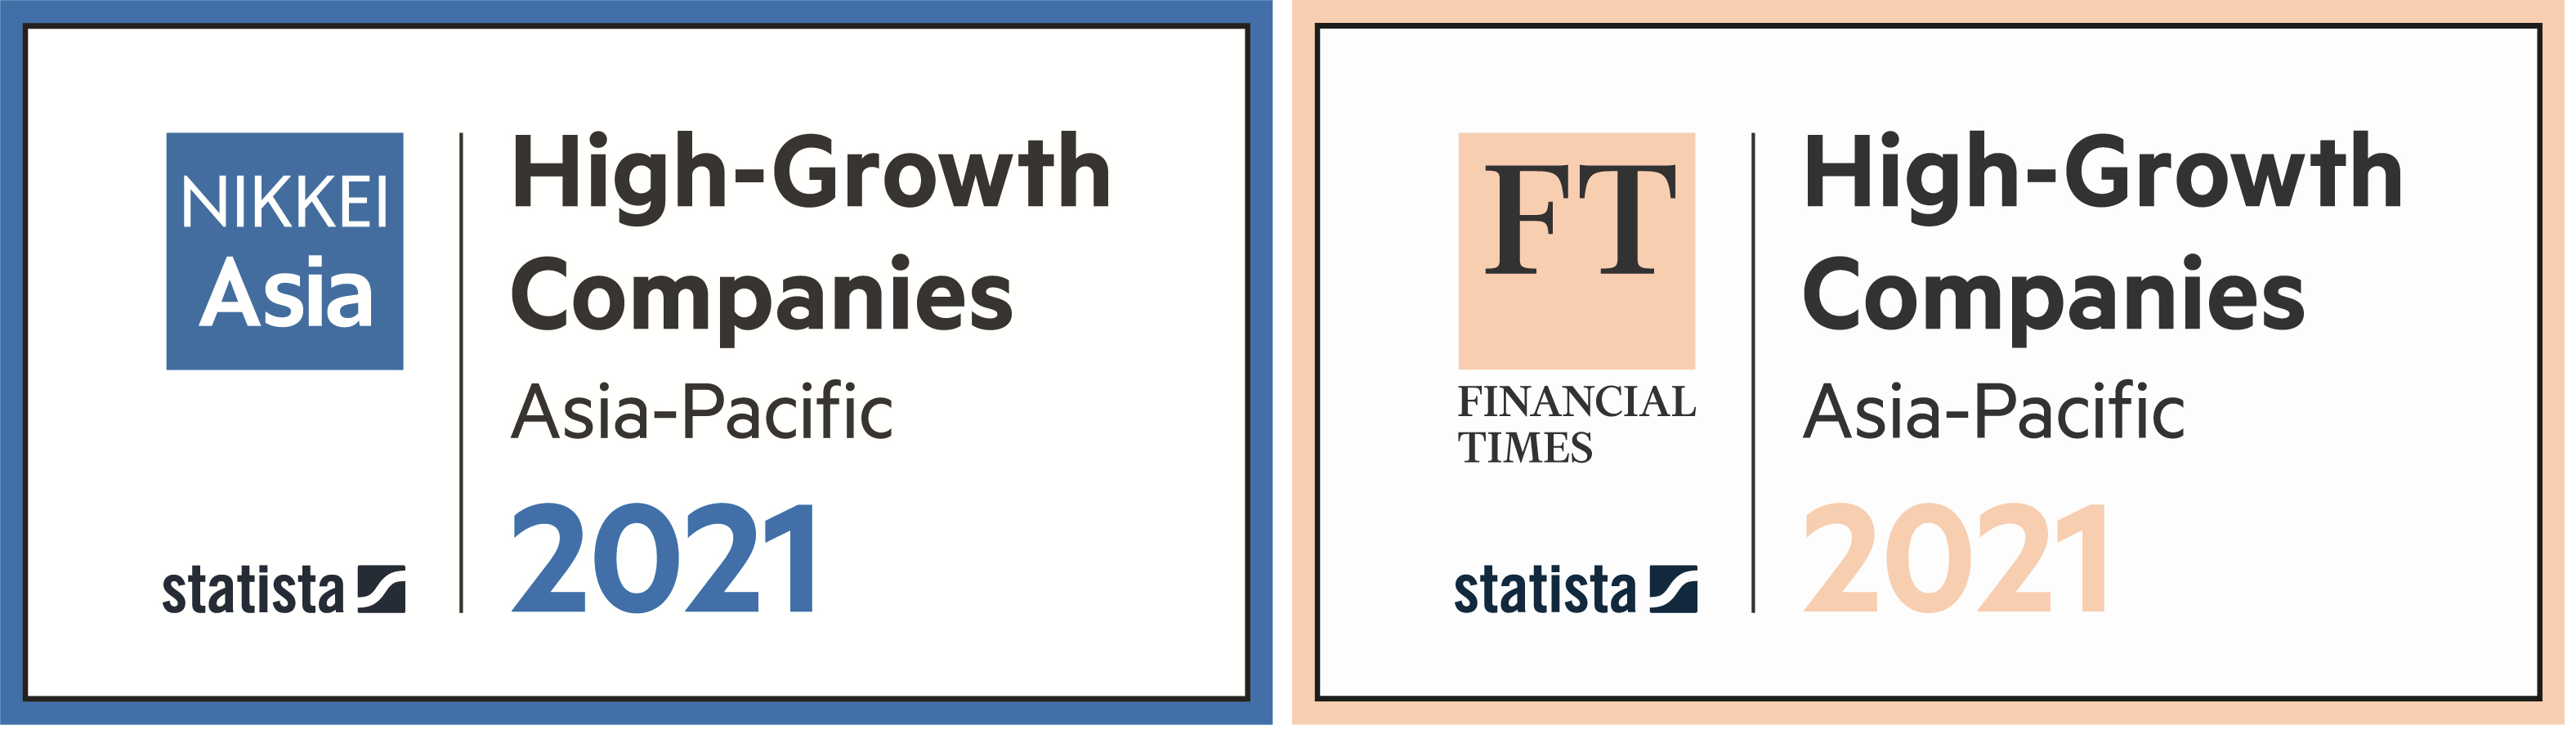 High-Growth Companies Asia-Pacific 2021